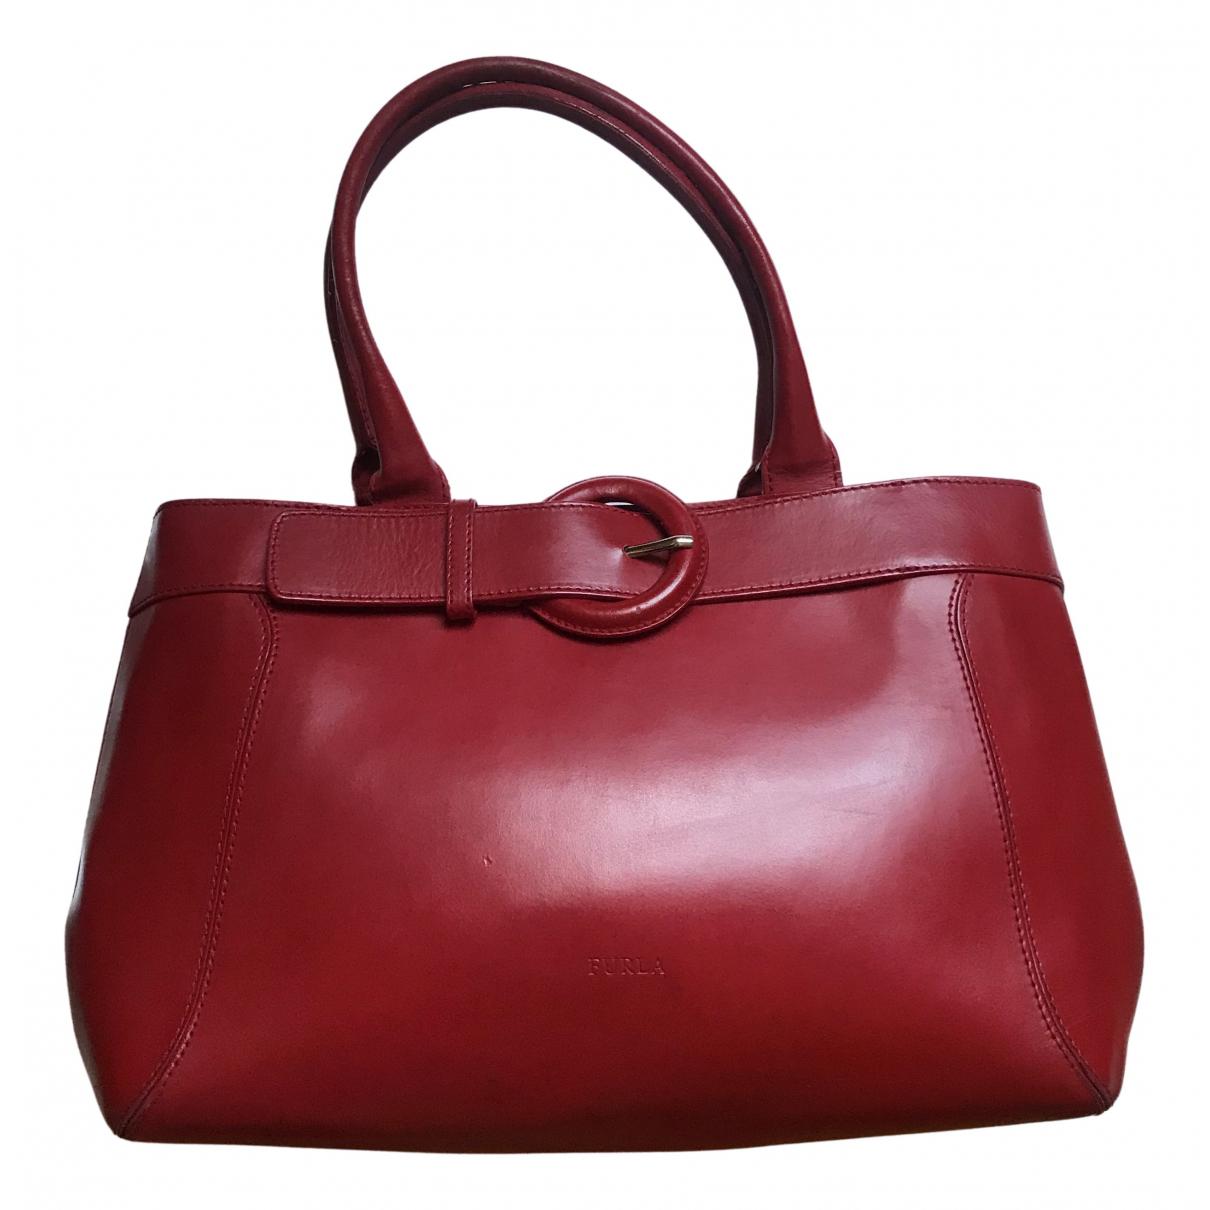 Furla N Red Leather handbag for Women N